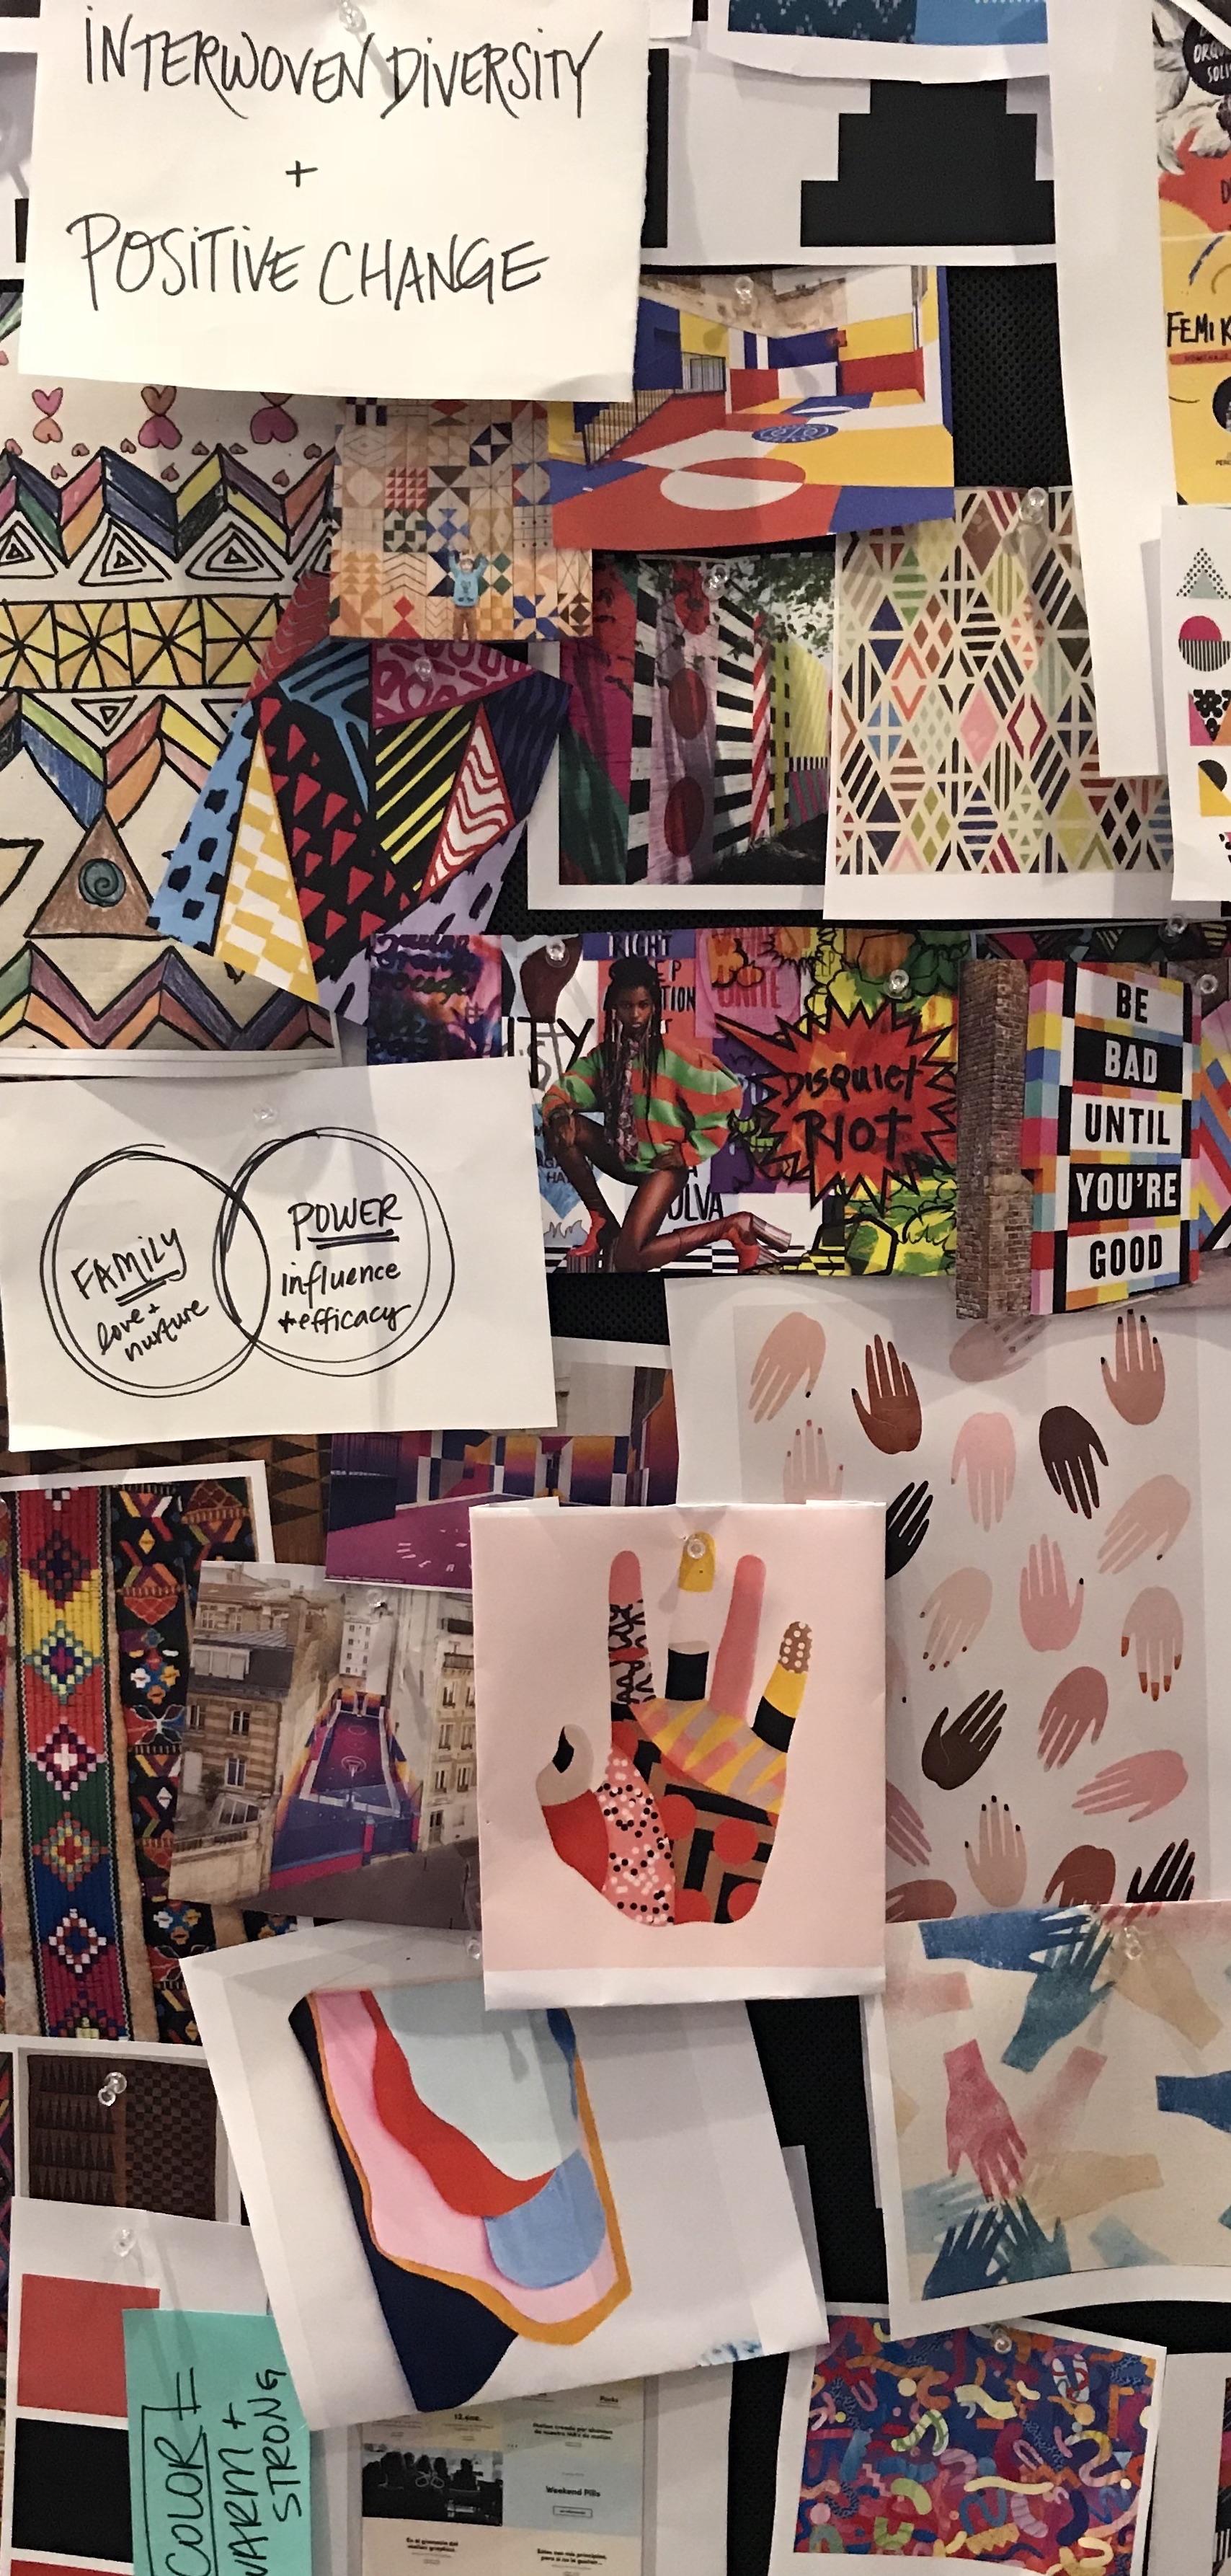 design mood board, concepting, inspiration